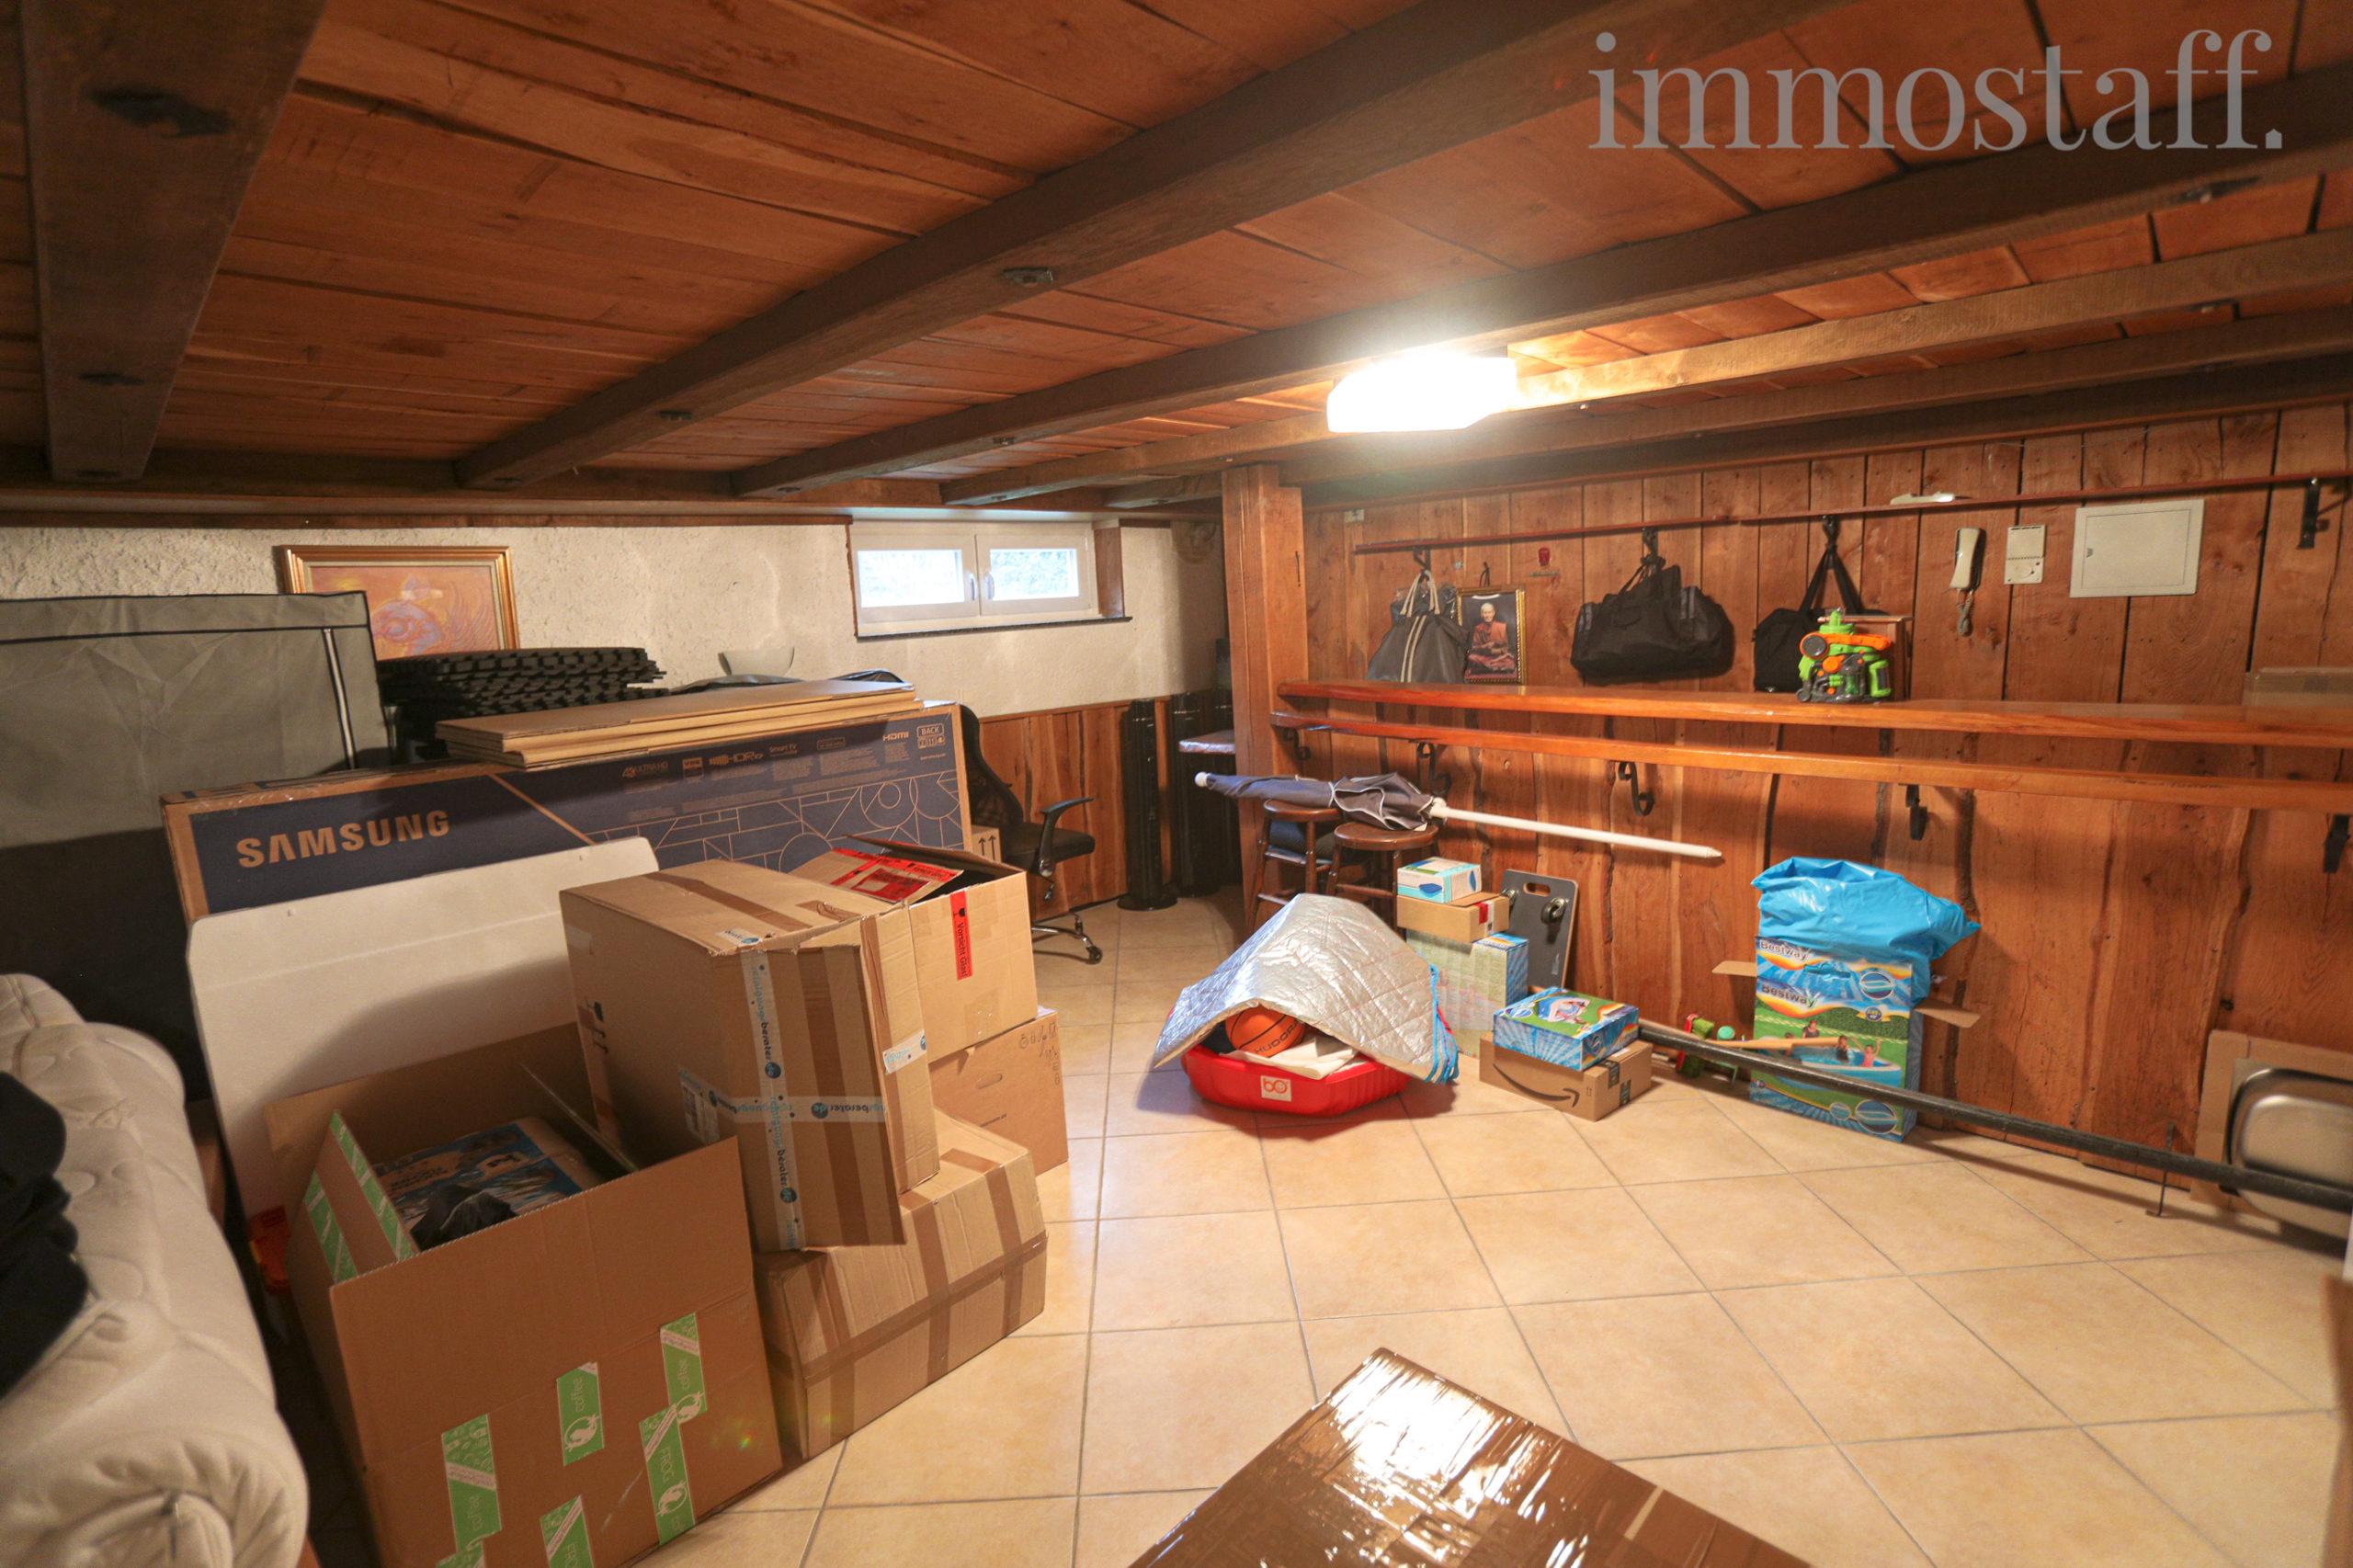 Kellerbar & Partyraum im Kellergeschoss